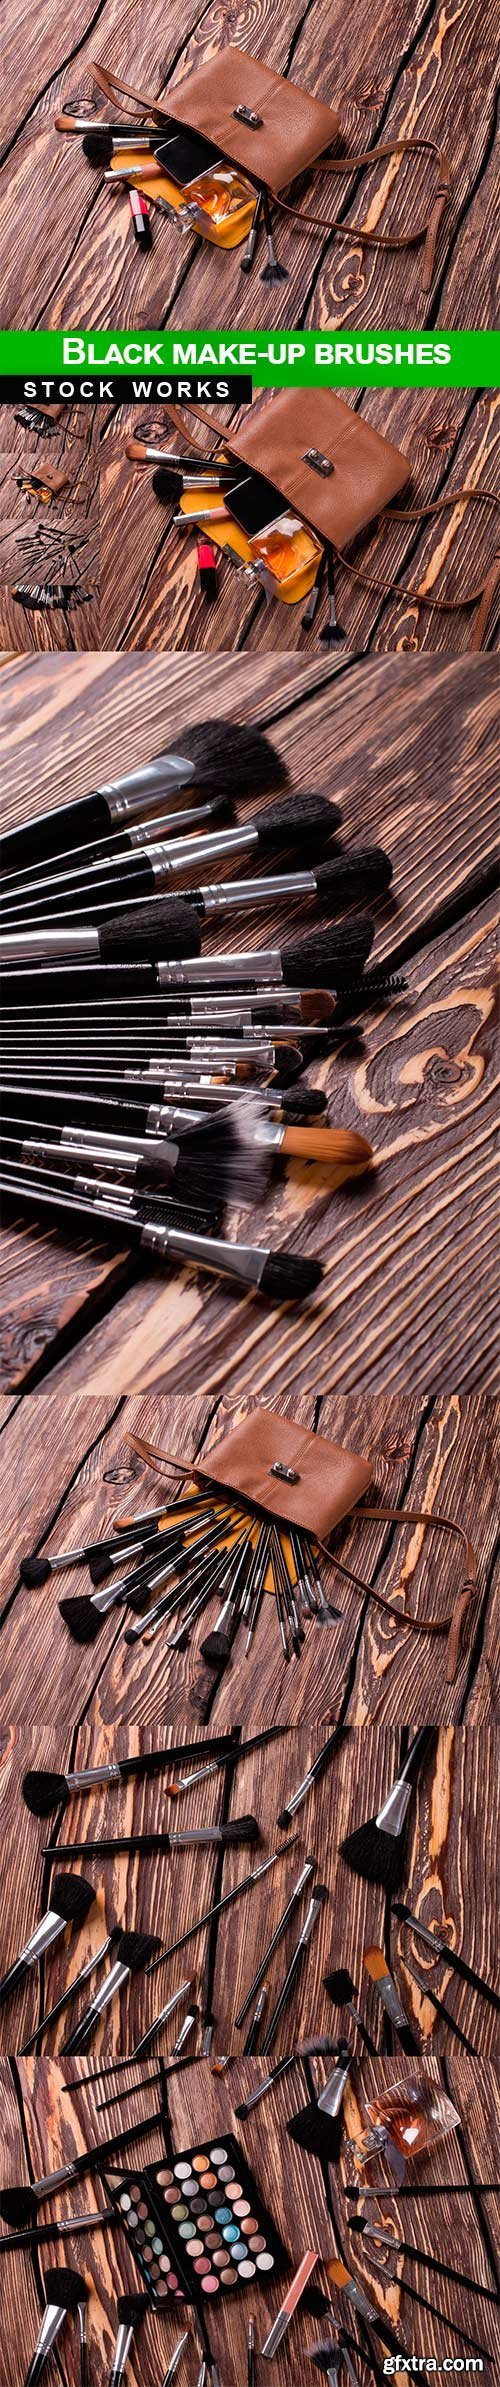 Black make-up brushes